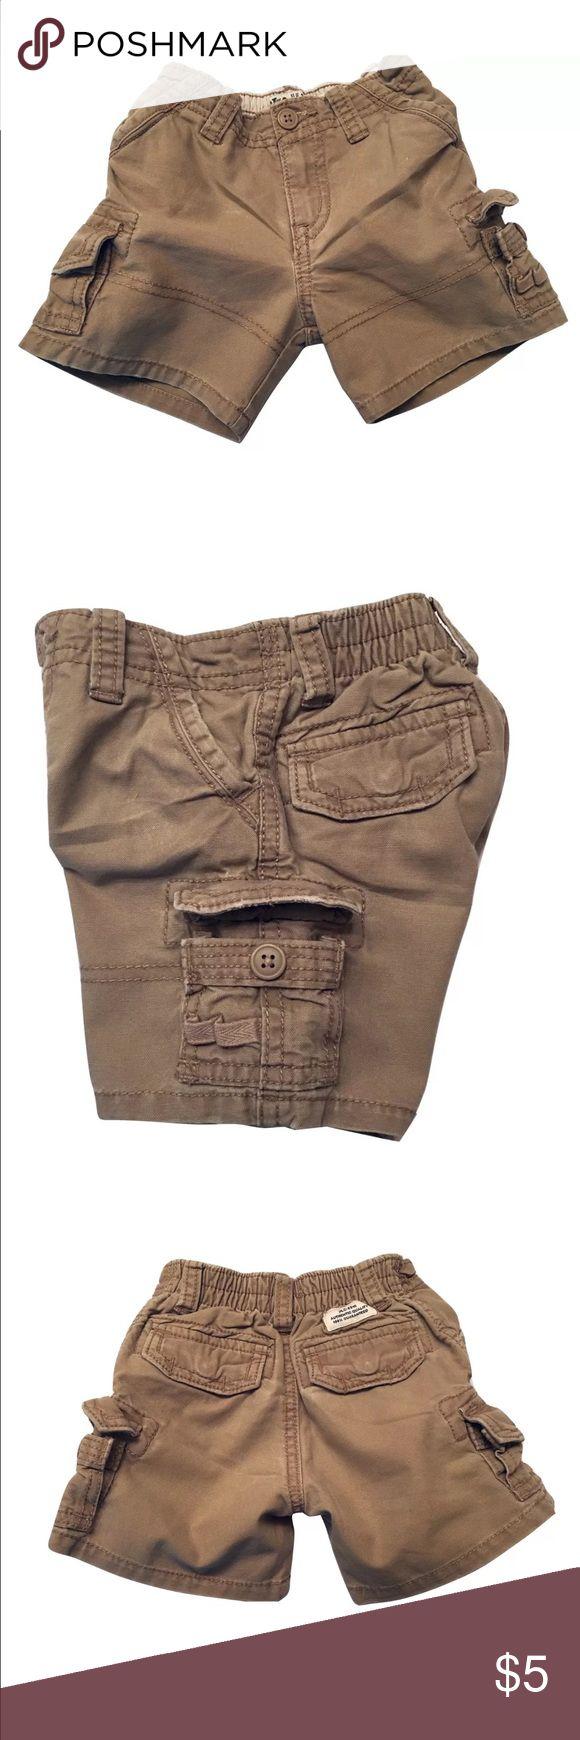 Children Place Boys Cargo Shorts Size 12m • Cargo pocket side  • Adjustable waist/elasticized waistband Children's Place Bottoms Shorts